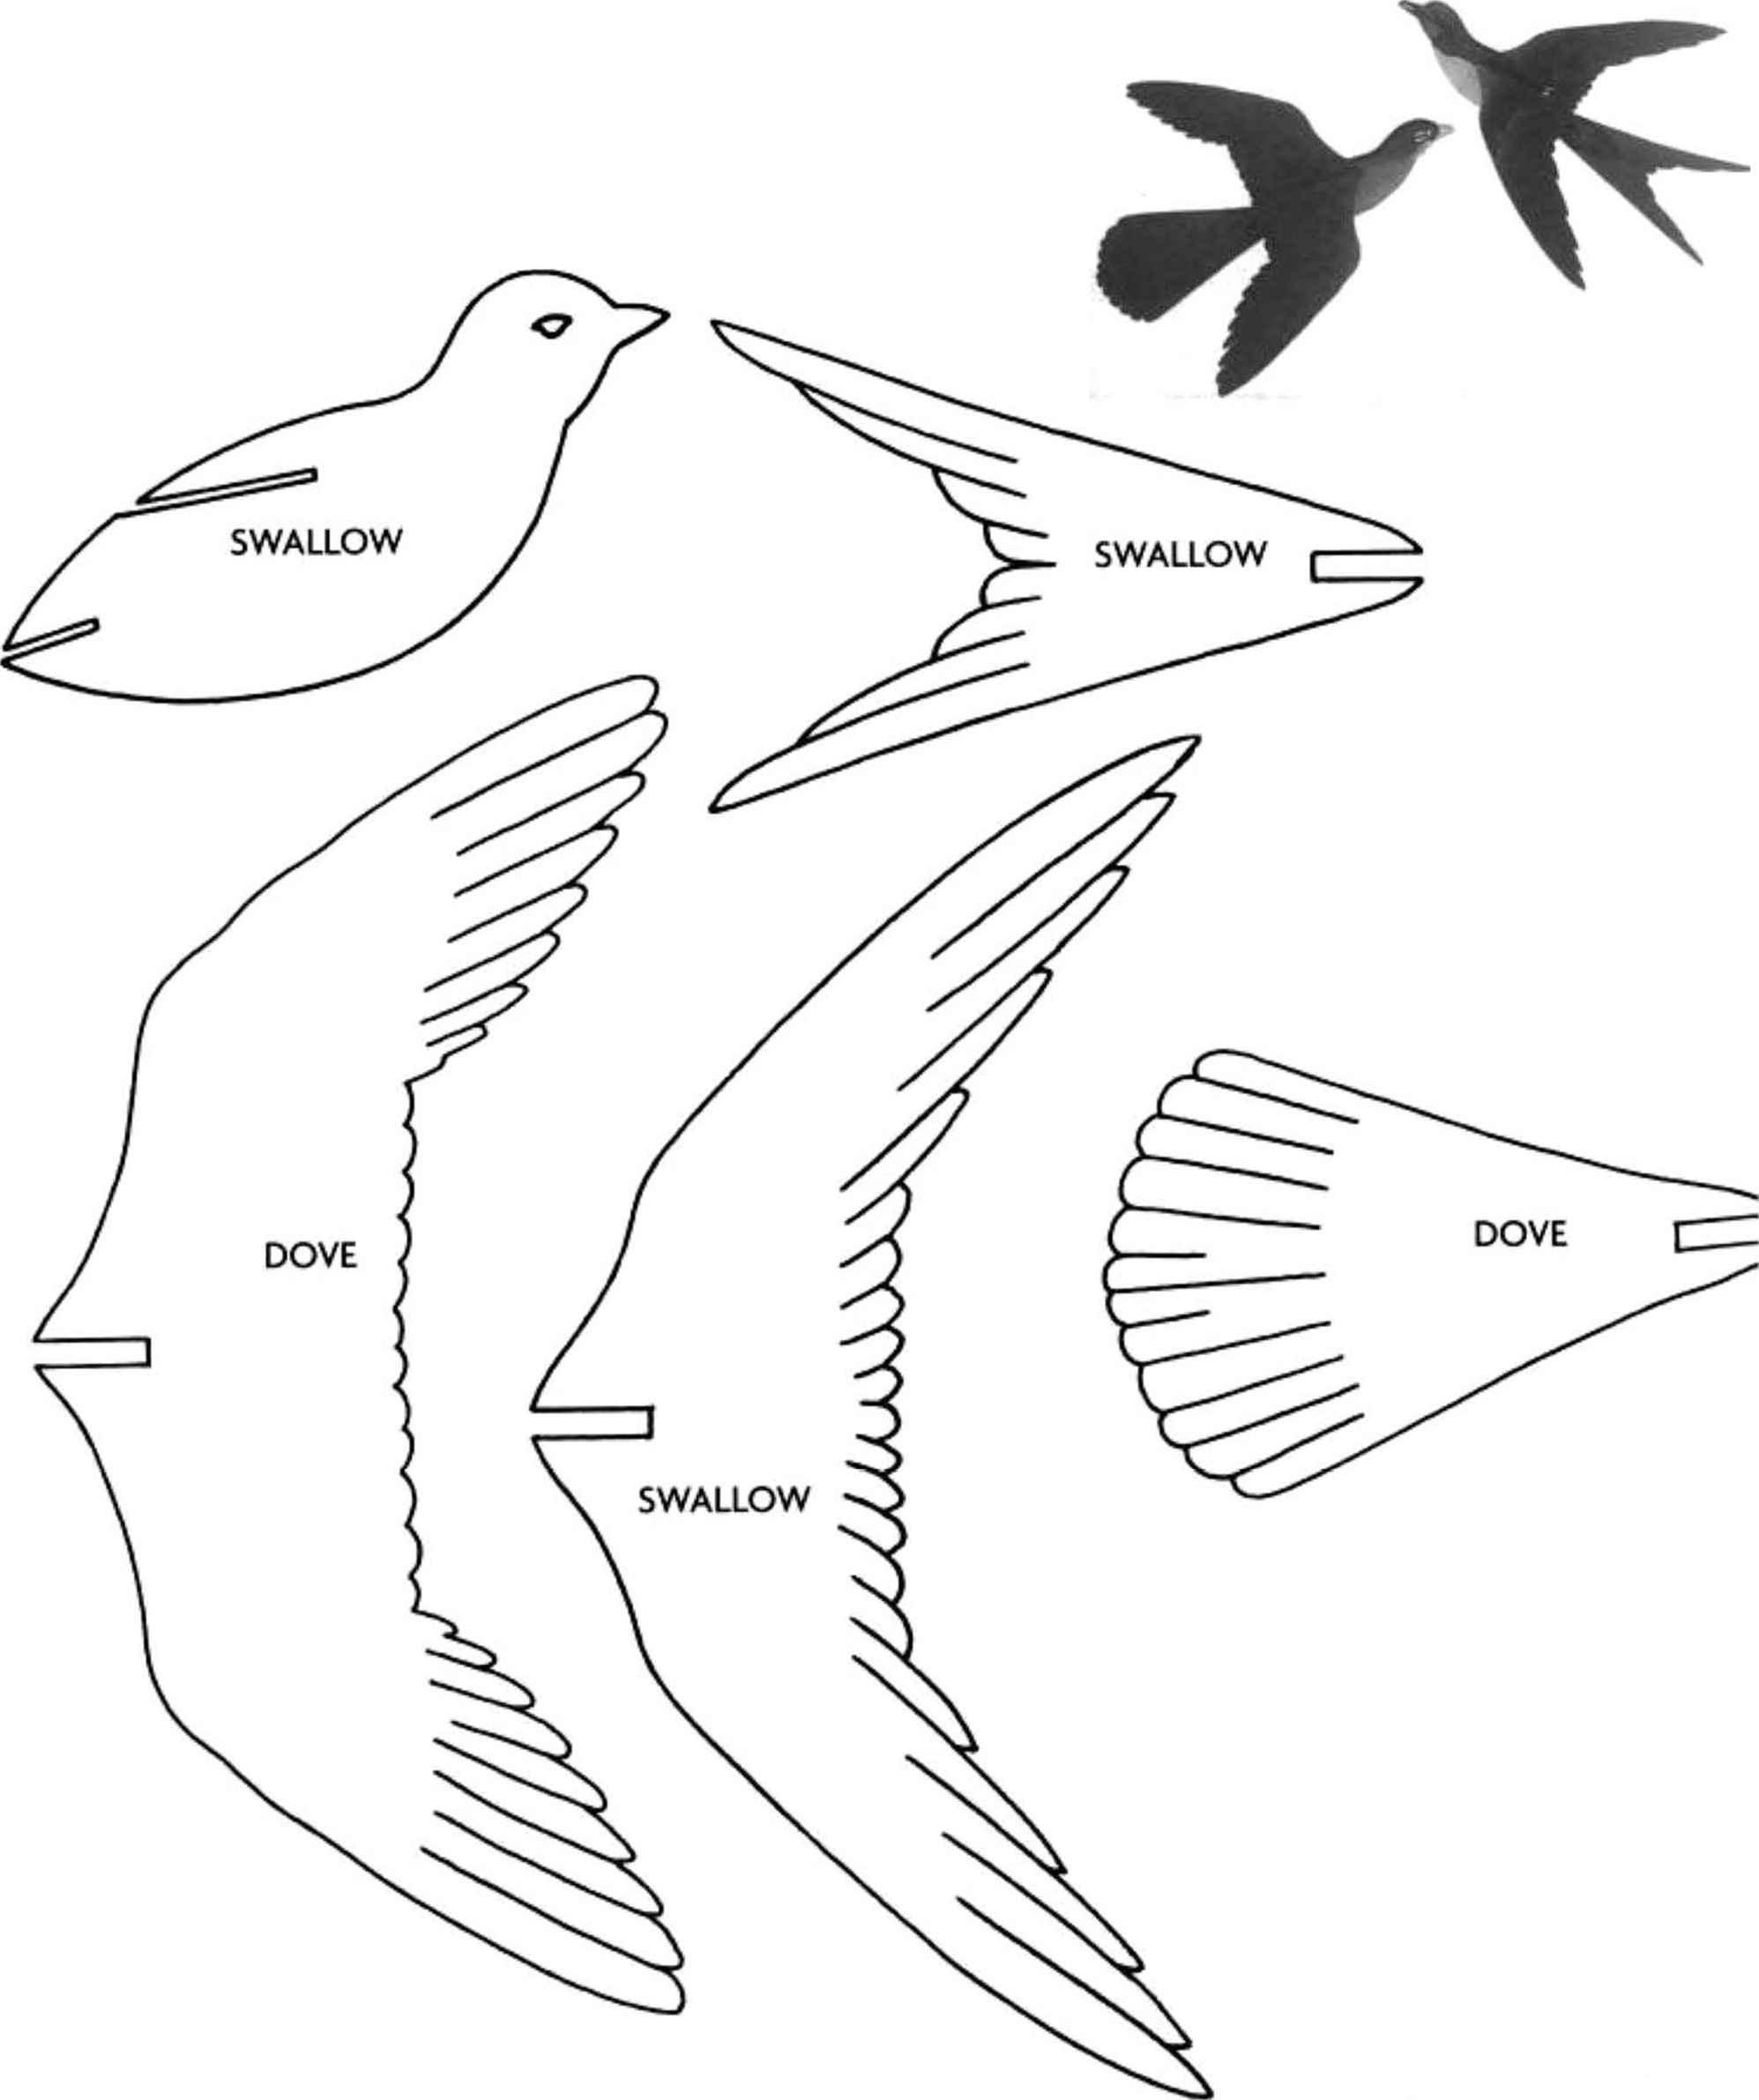 balancing bird template - decorative birds scroll saw woodworking archive